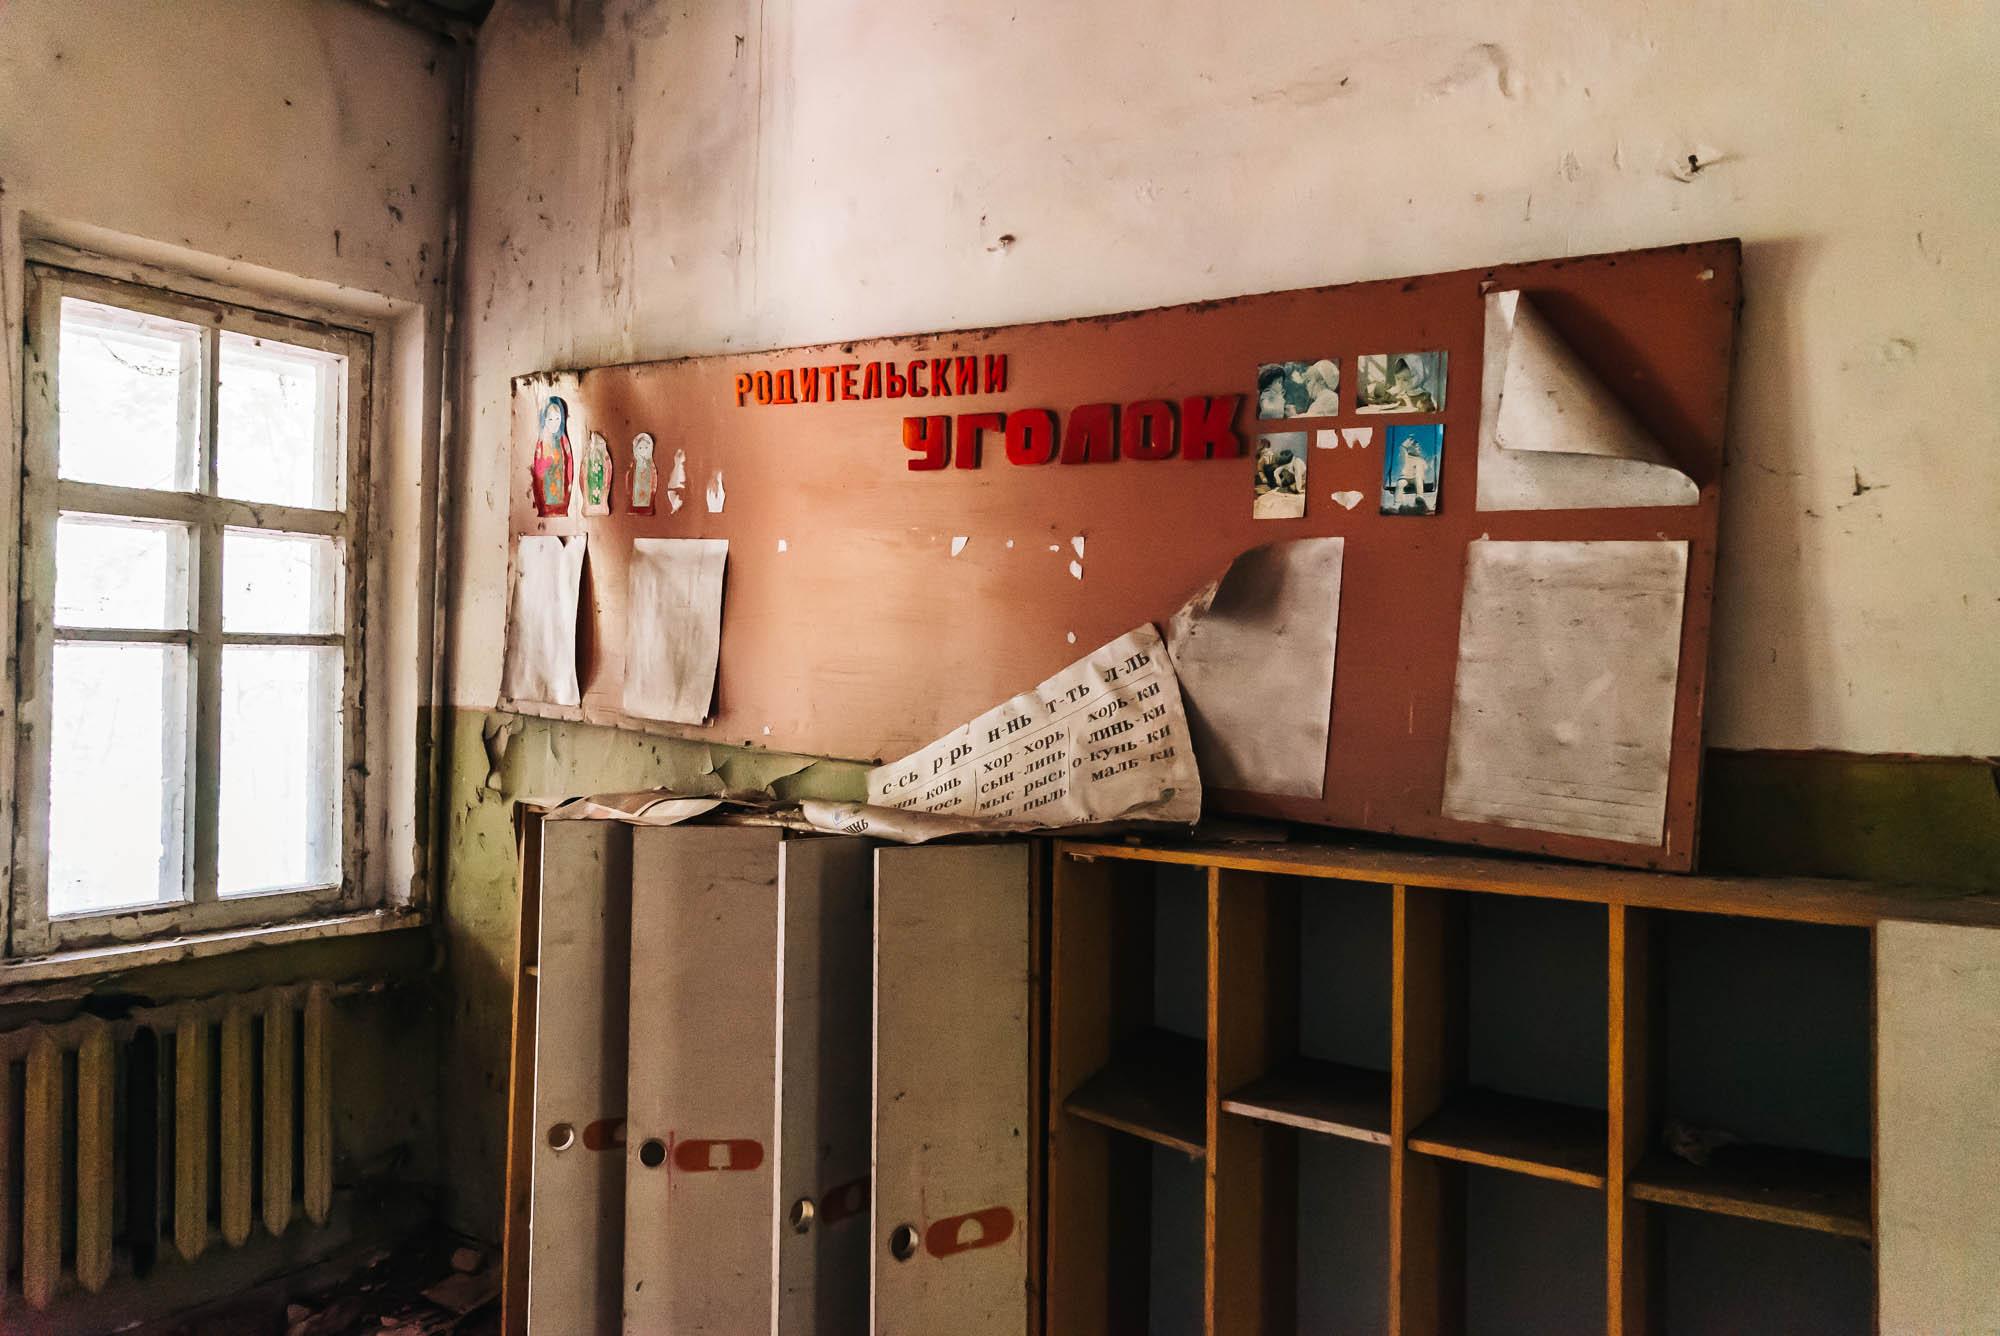 Abandoned nursery in Chernobyl